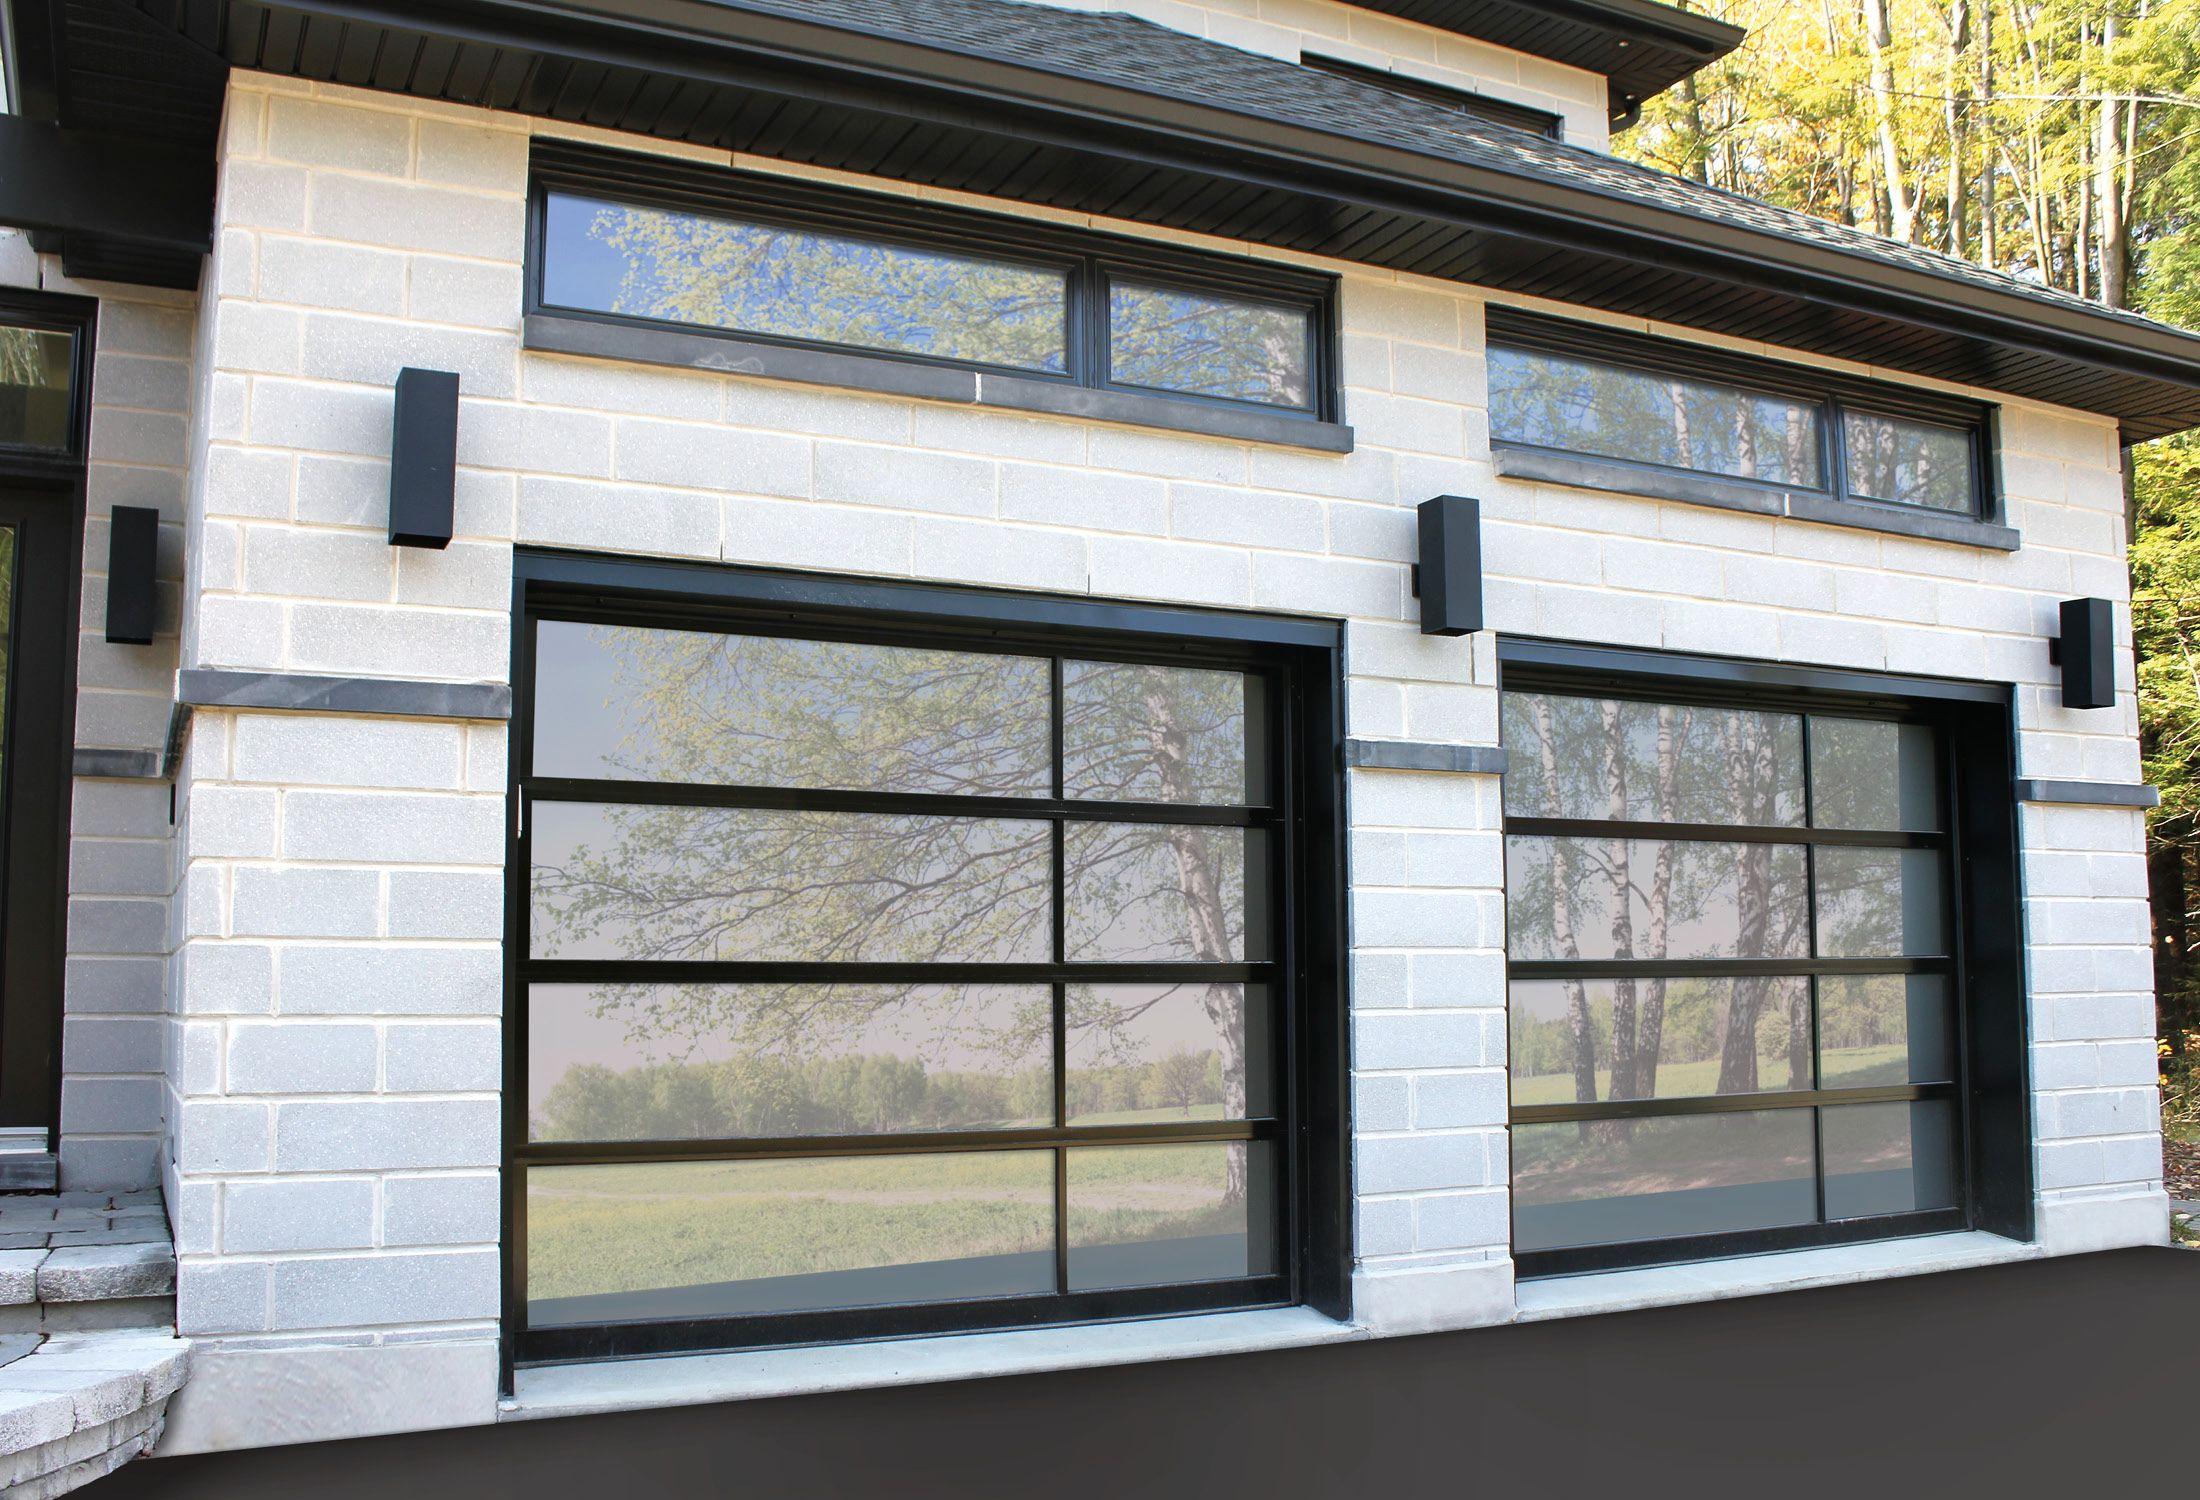 Porte De Garage Maison Moderne | Porte De Garage Assortie à La ...